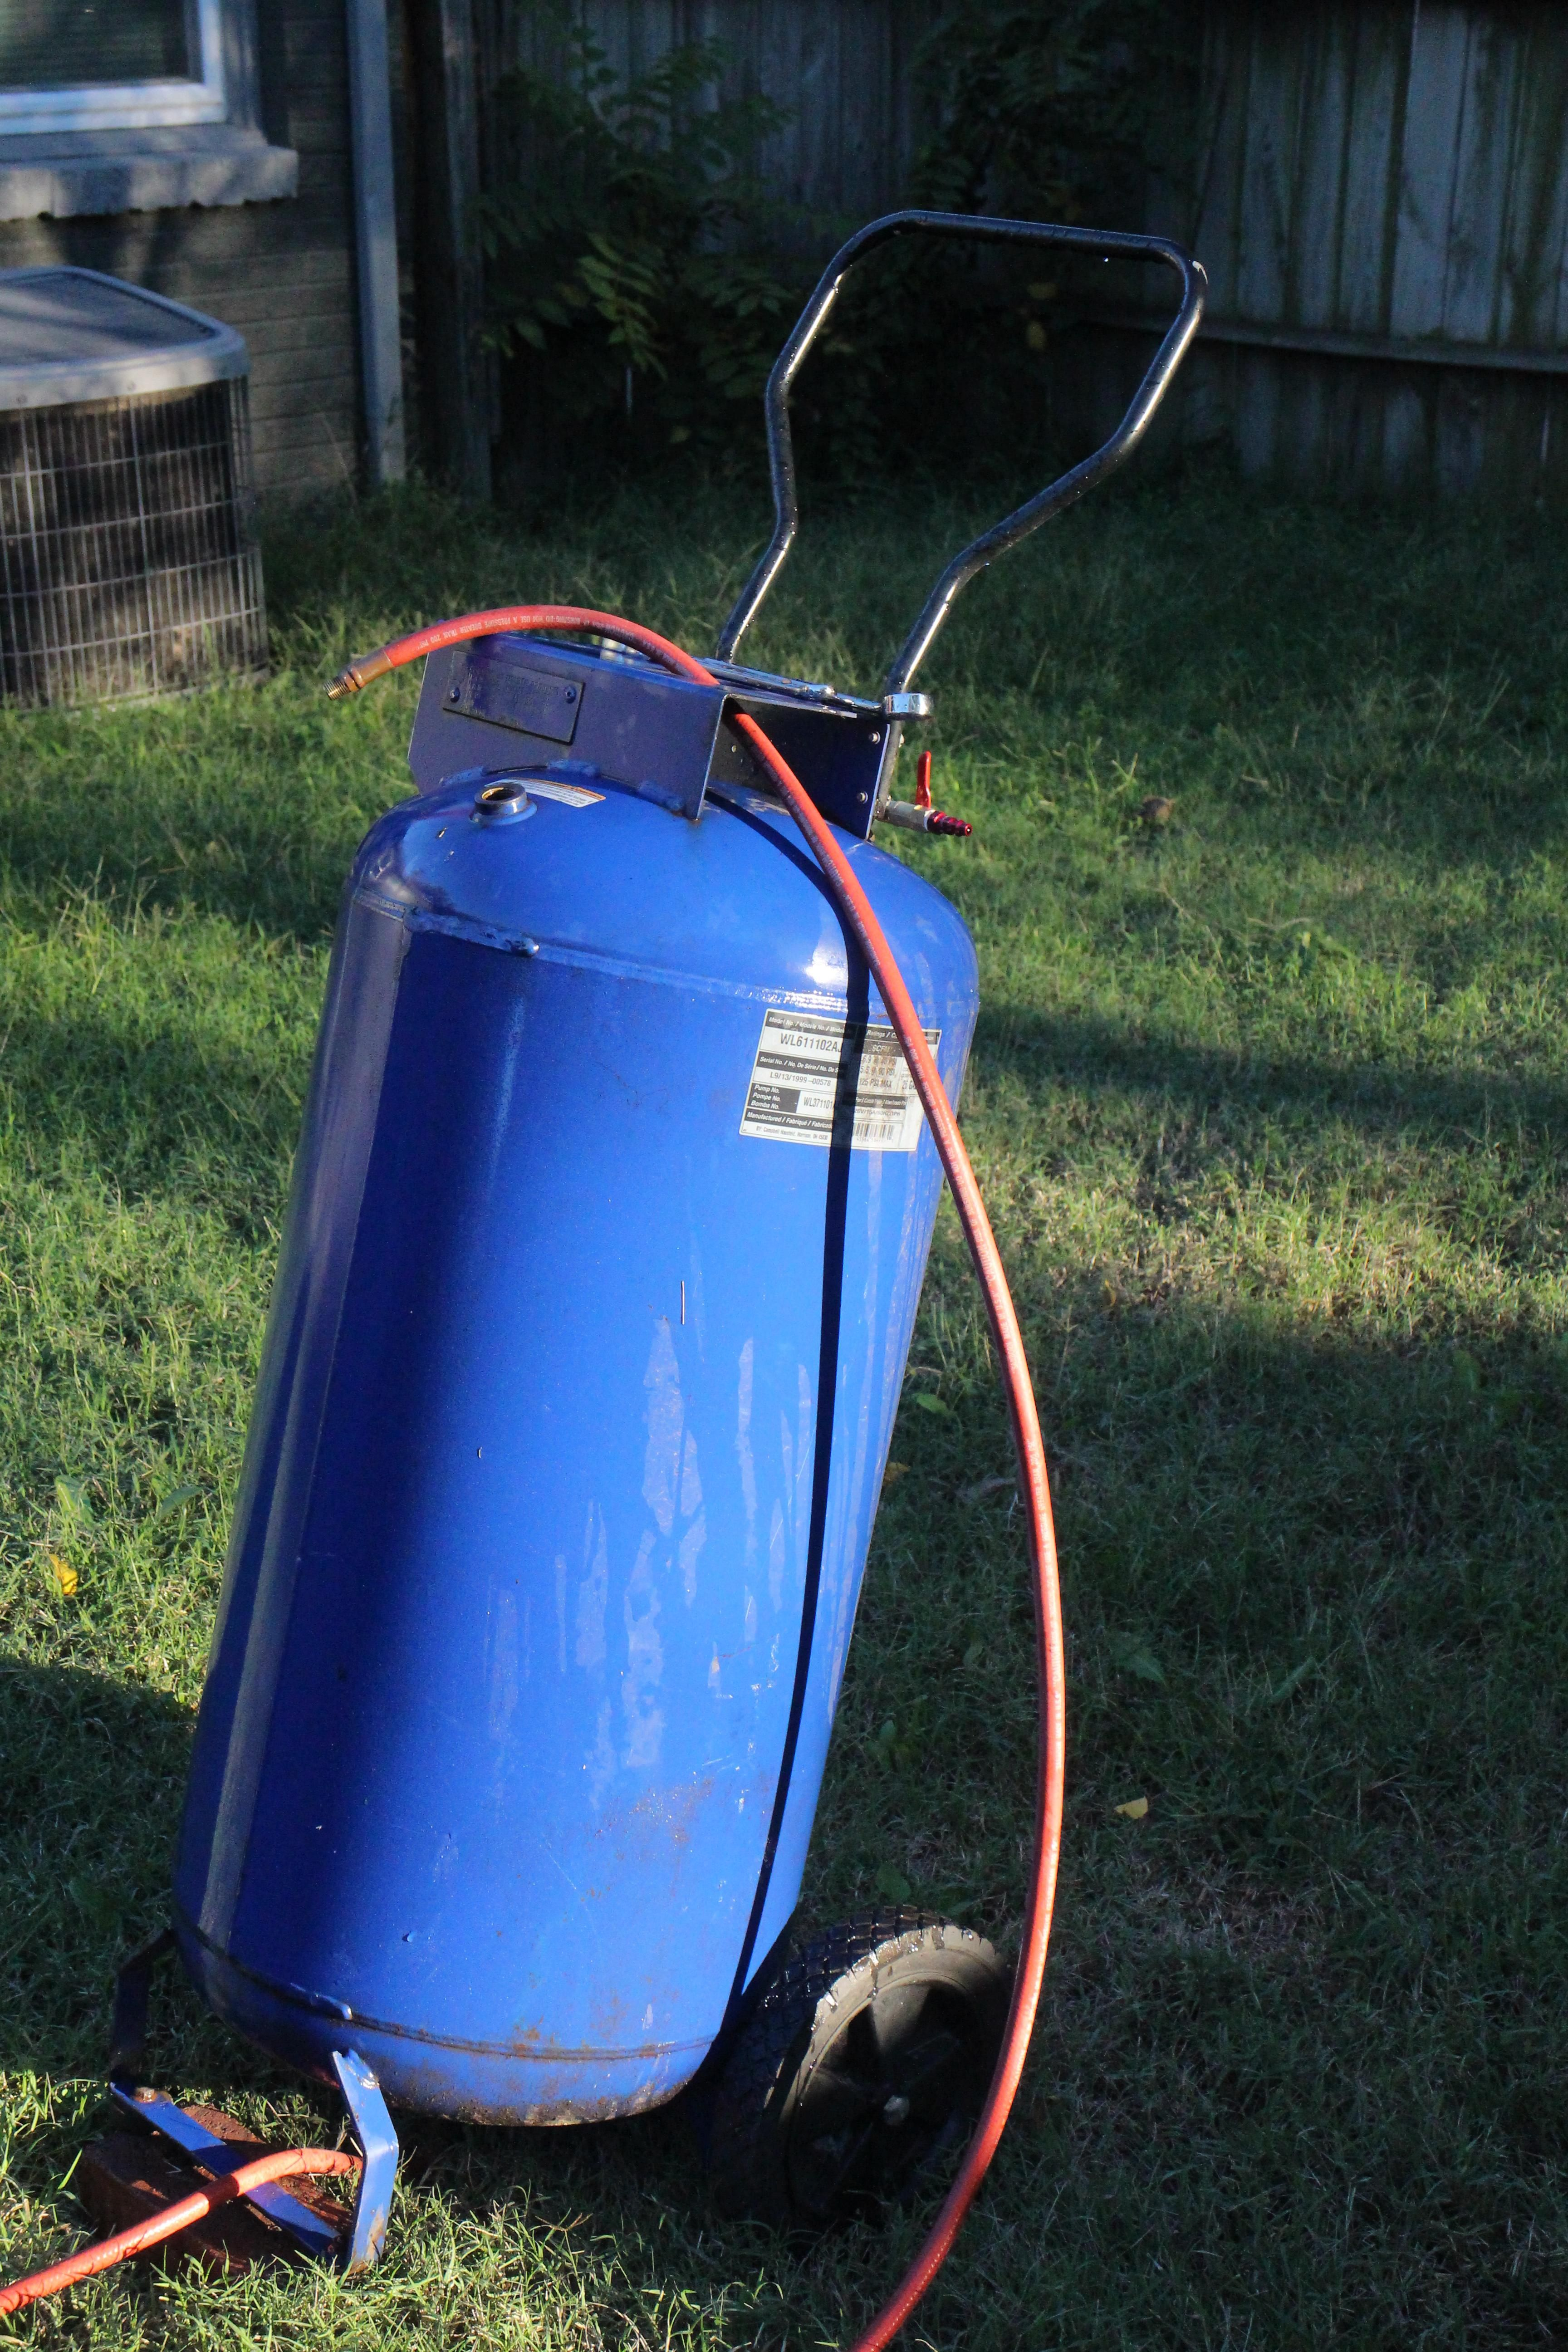 Air Compressor Repair and Upgrade handmade crafts HowTo